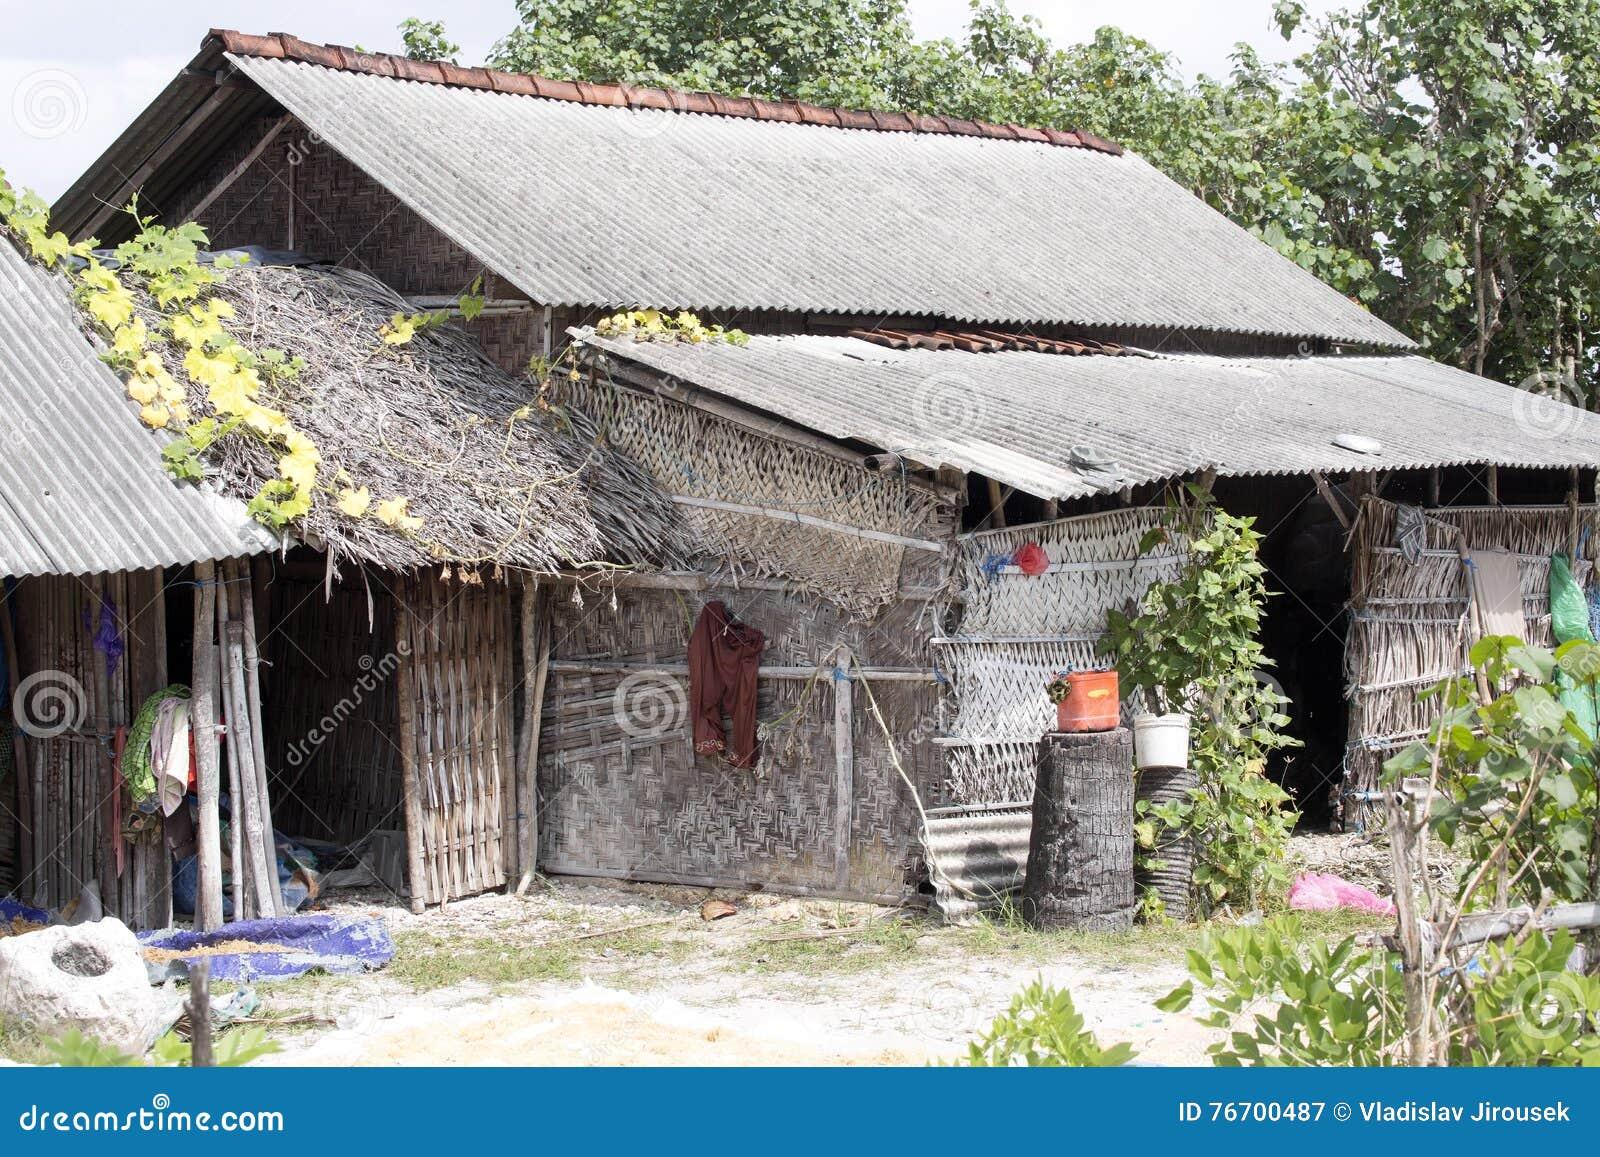 Fattiga kojahavsväxtihopsamlare, Nusa Penida, Indonesien